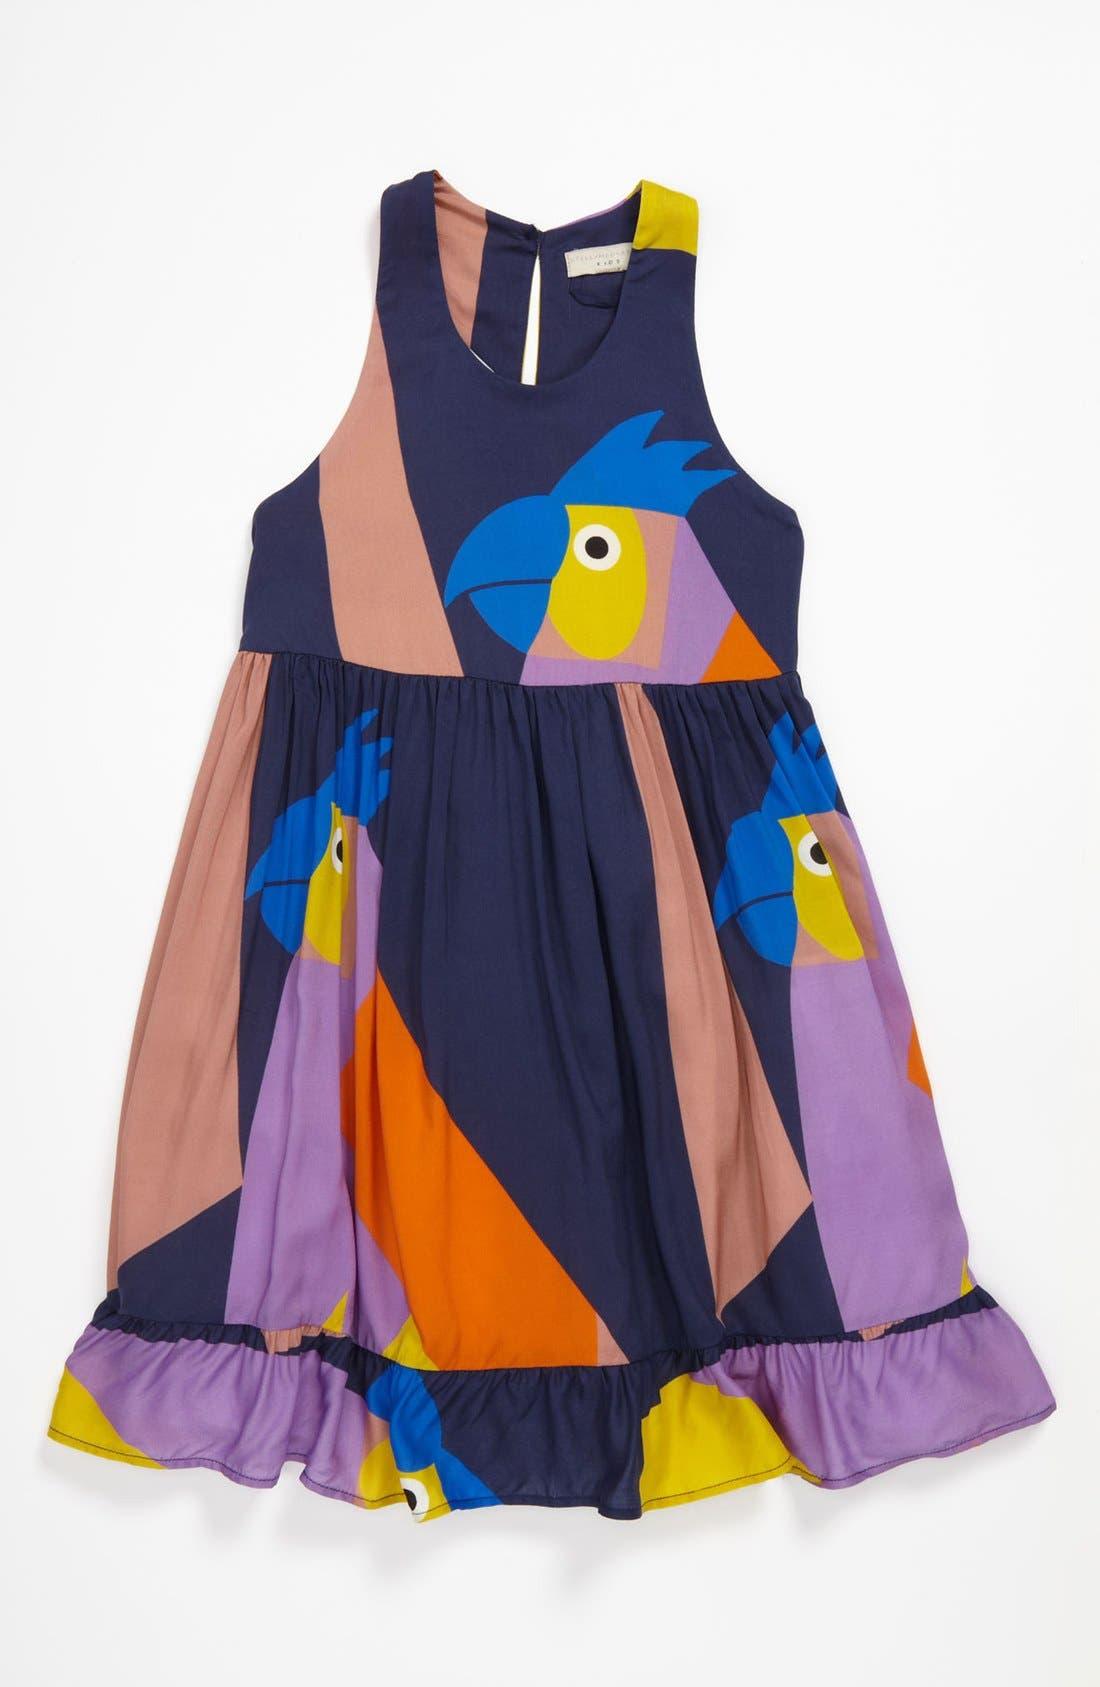 Alternate Image 1 Selected - Stella McCartney Kids 'Pip' Dress (Toddler, Little Girls & Big Girls)